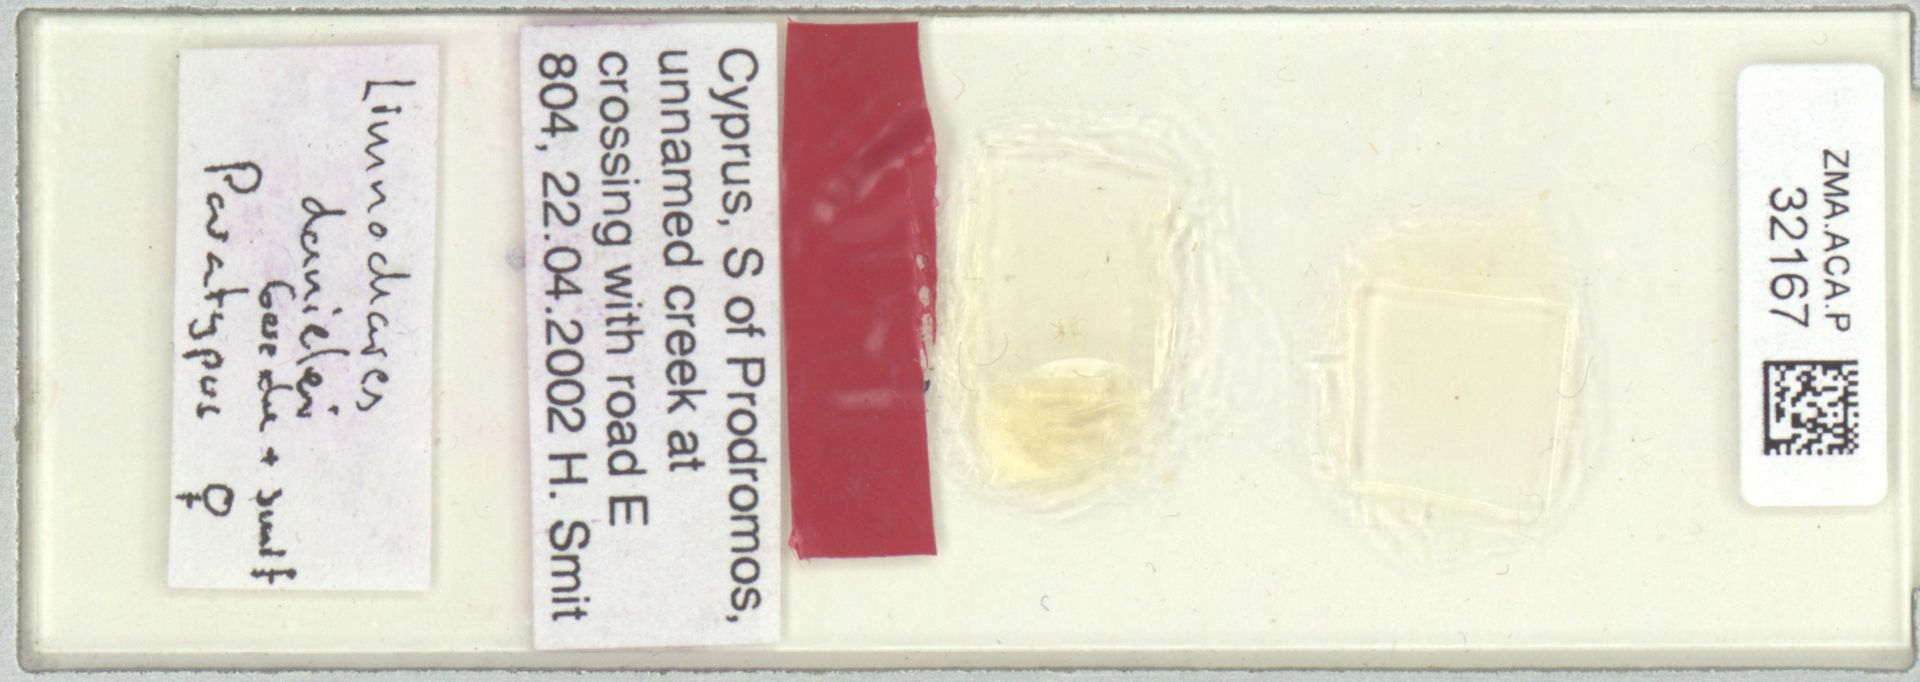 ZMA.ACA.P.32167   Limnochares danielei Gerecke & Smit, 2005